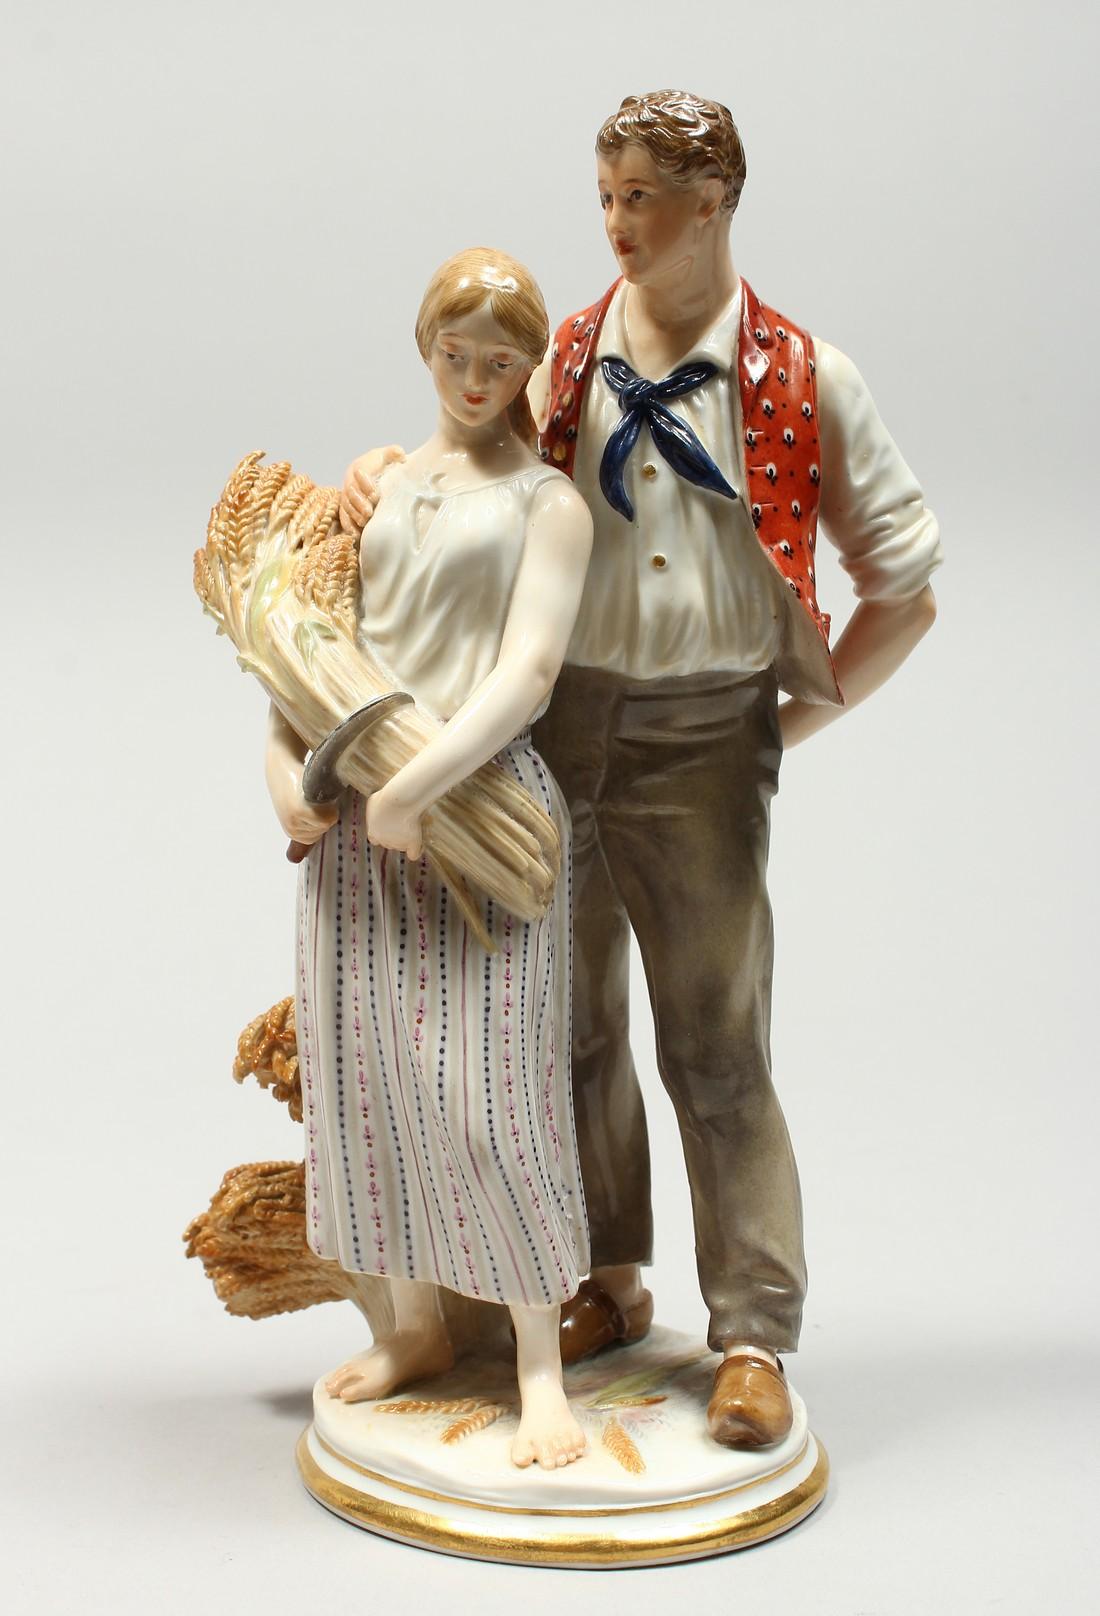 A GOOD MEISSEN PORCELAIN GROUP DEPICTING HARVEST, a pair of standing figures, a man beside a woman